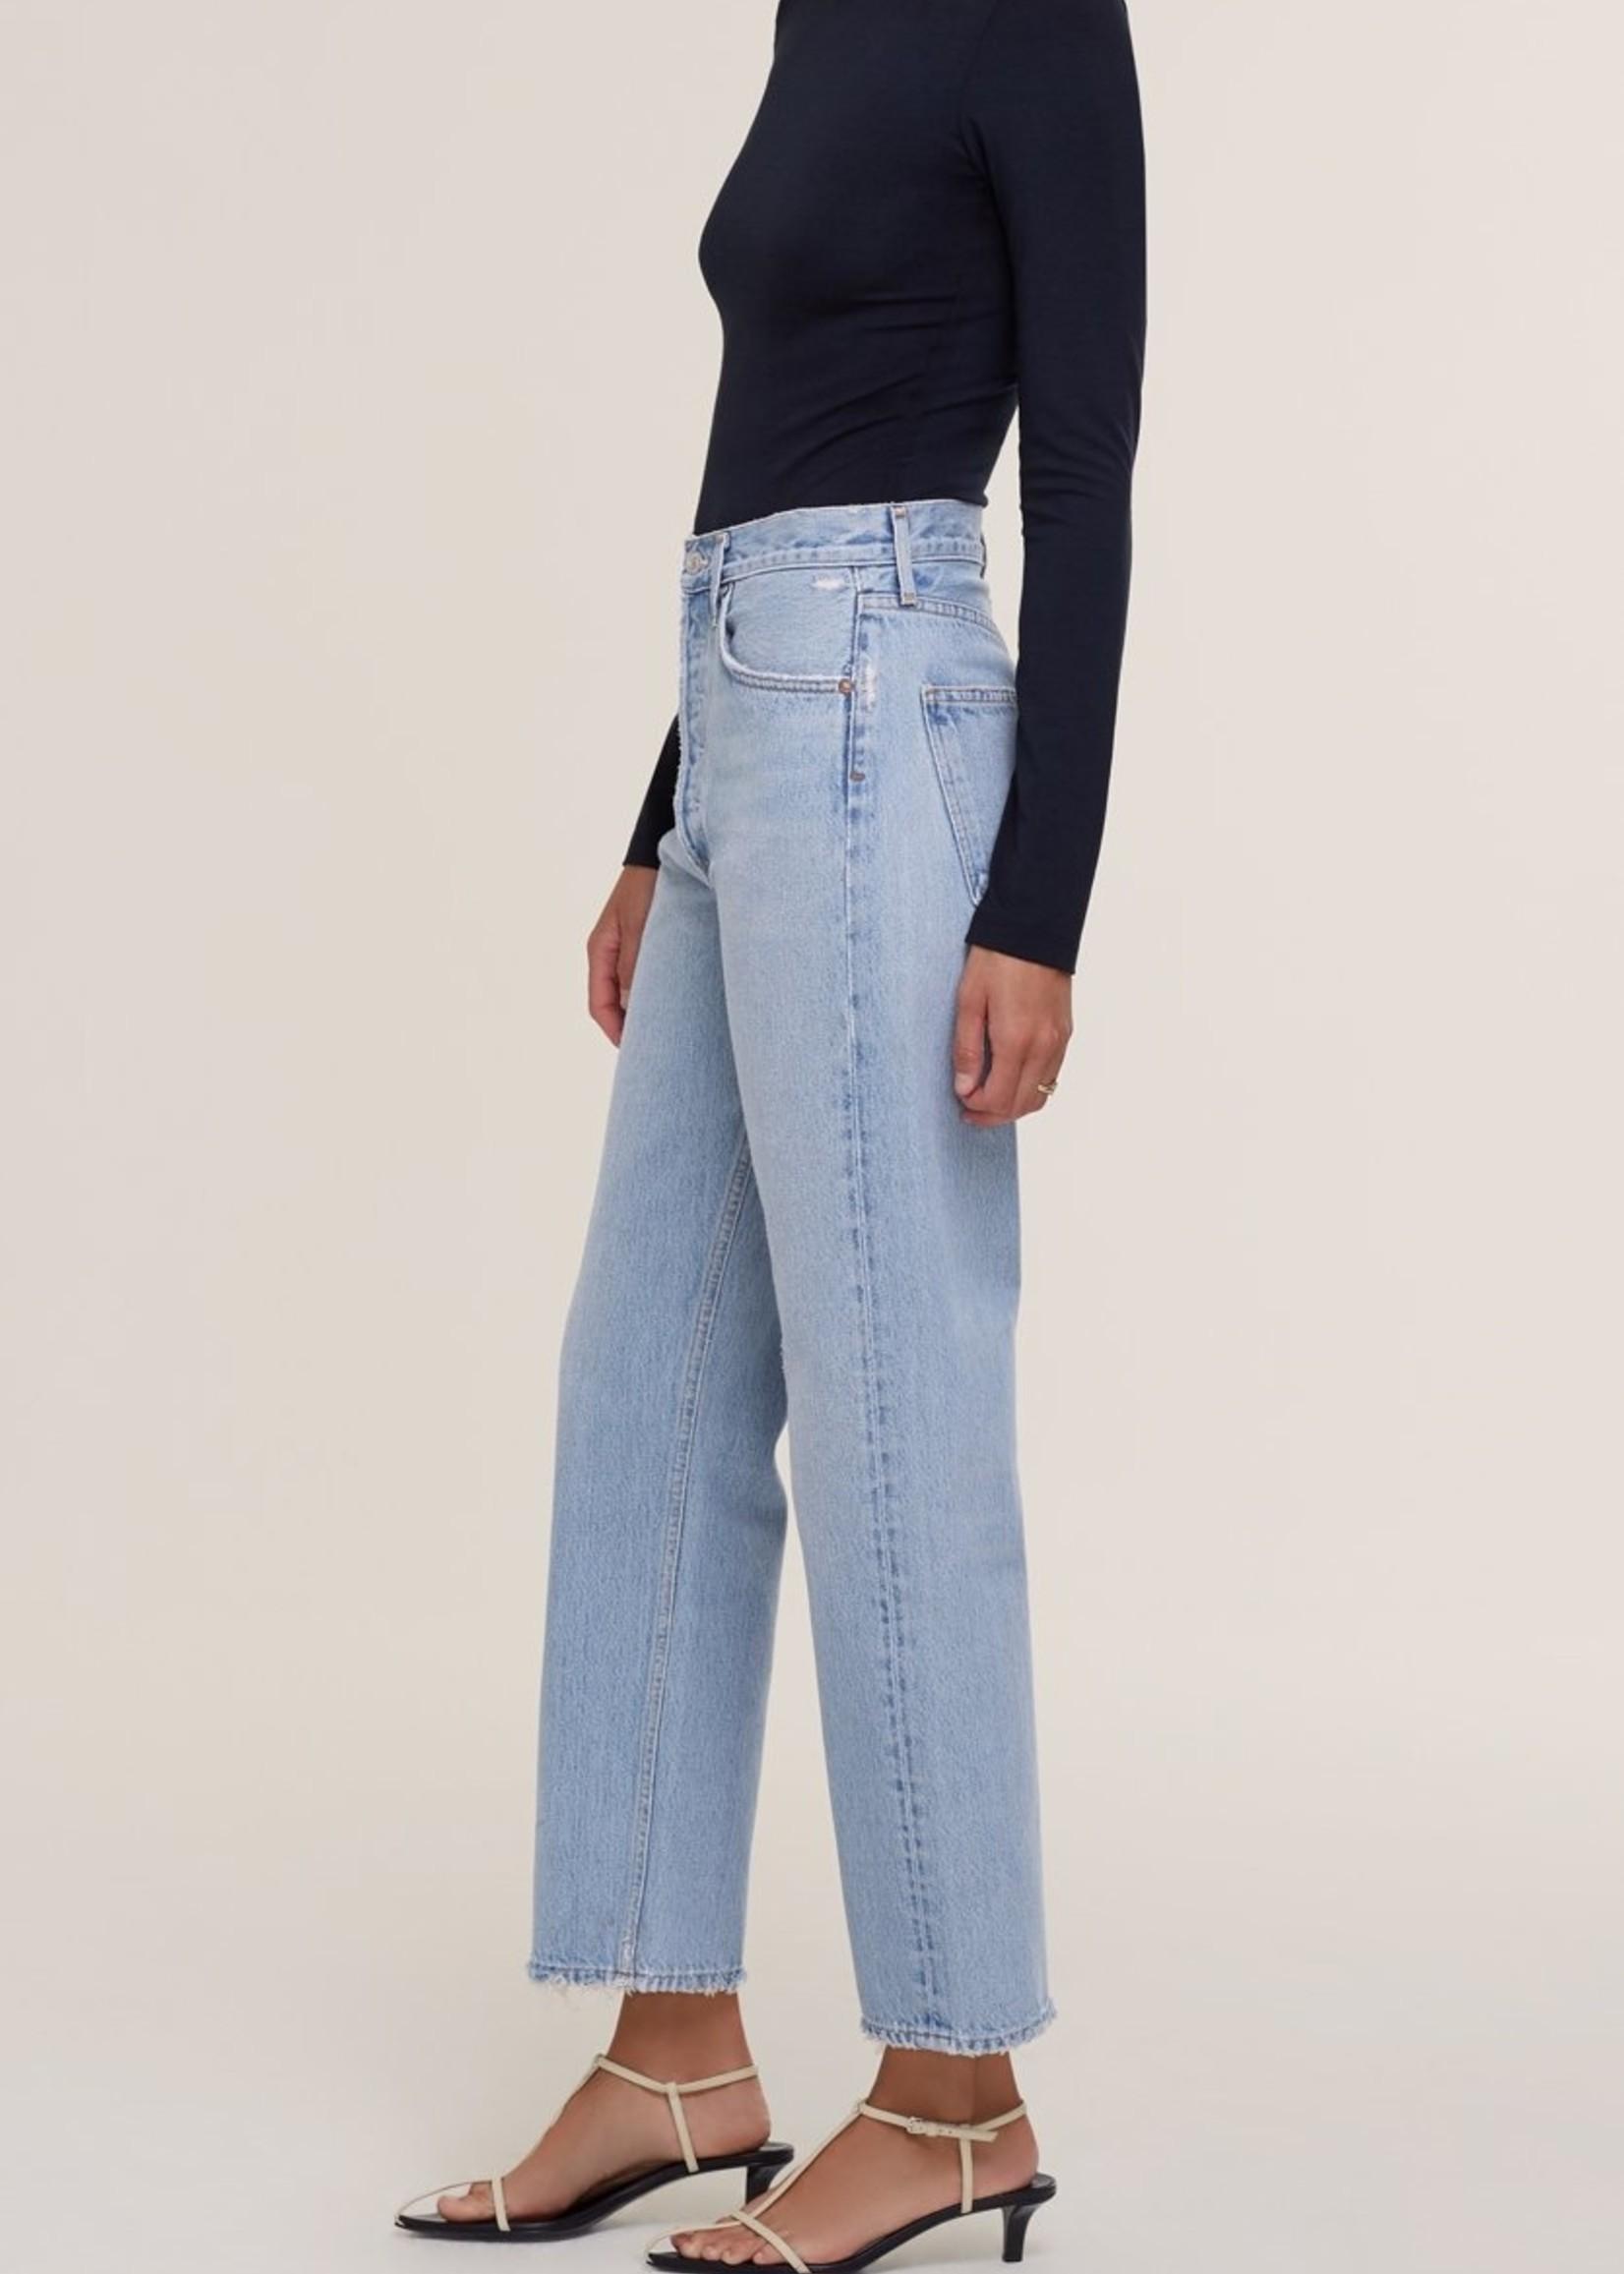 agolde agolde 90 s jean , semi tropic